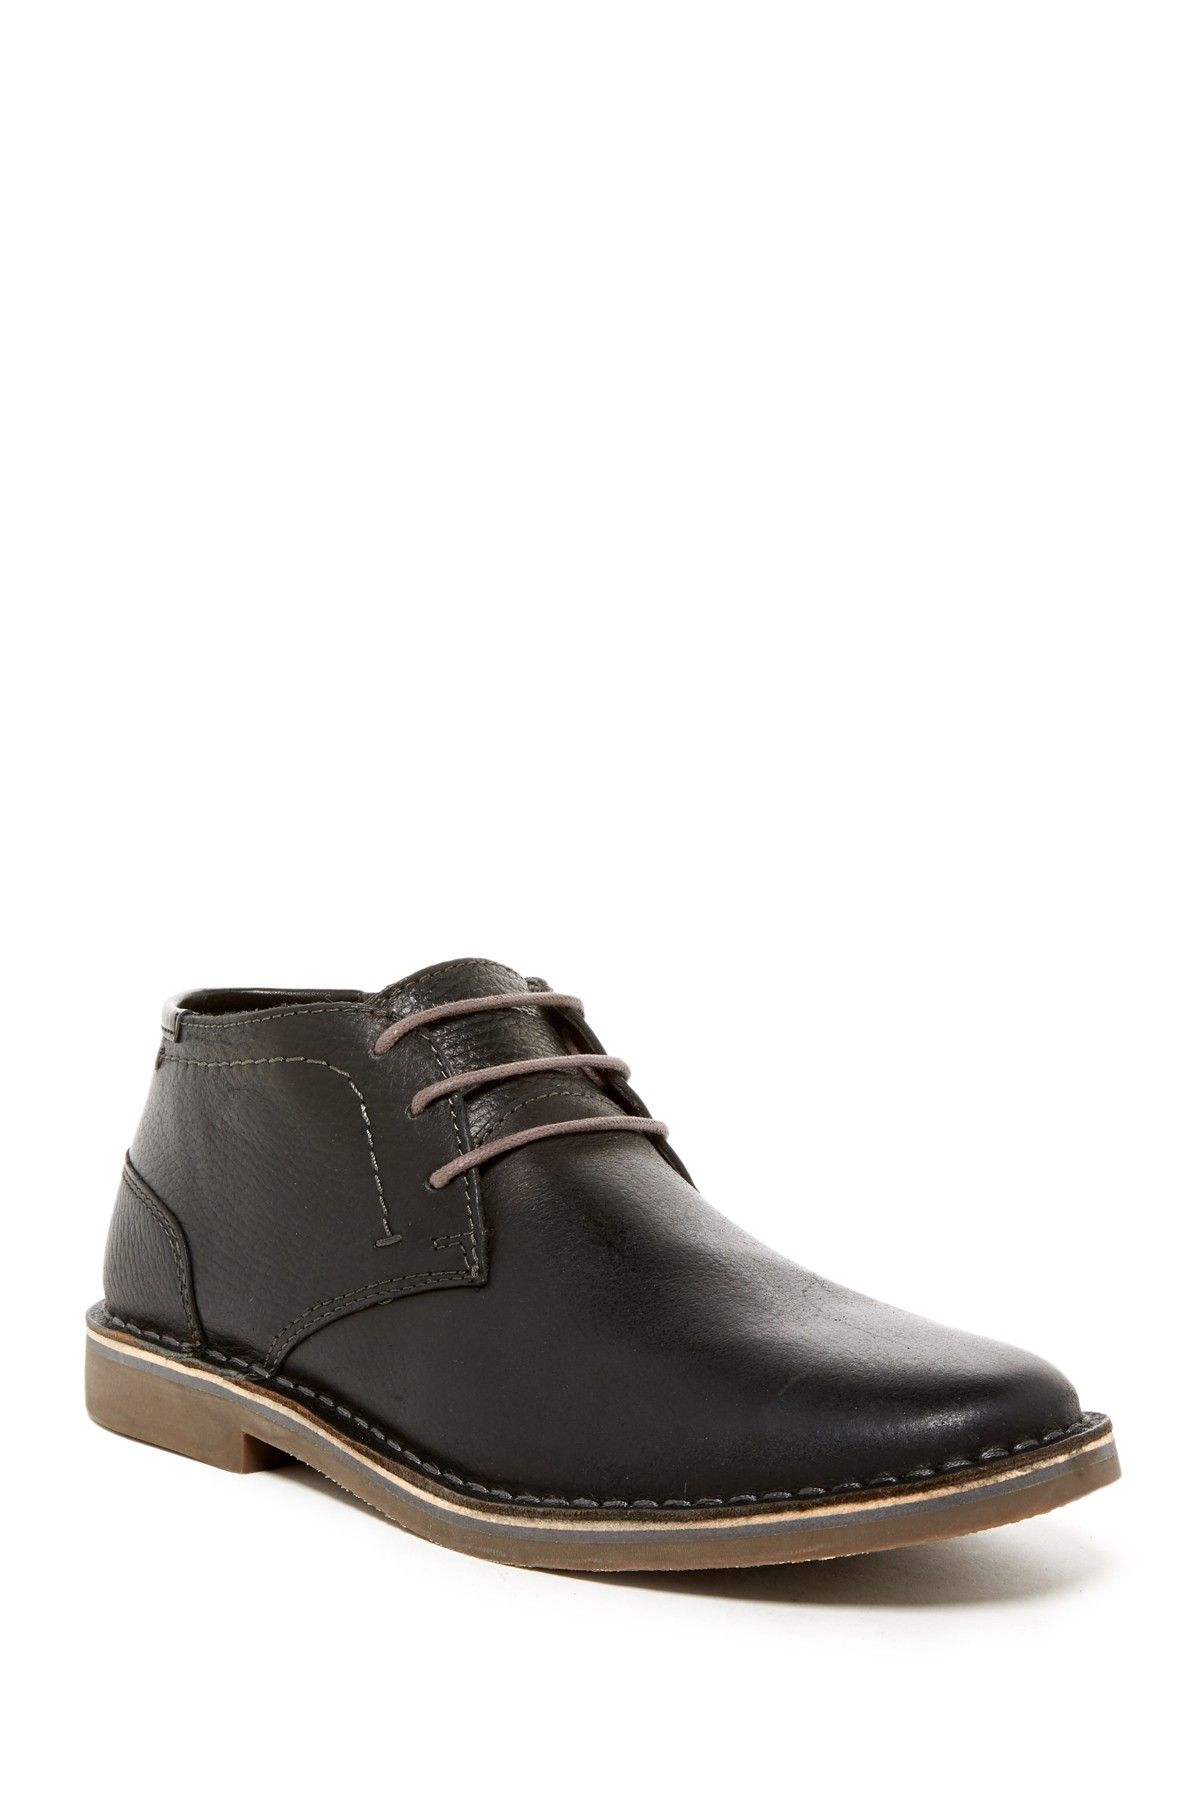 e64b3f85f Kenneth Cole Reaction - Desert Wind Chukka Boot (Men)   boots for ...